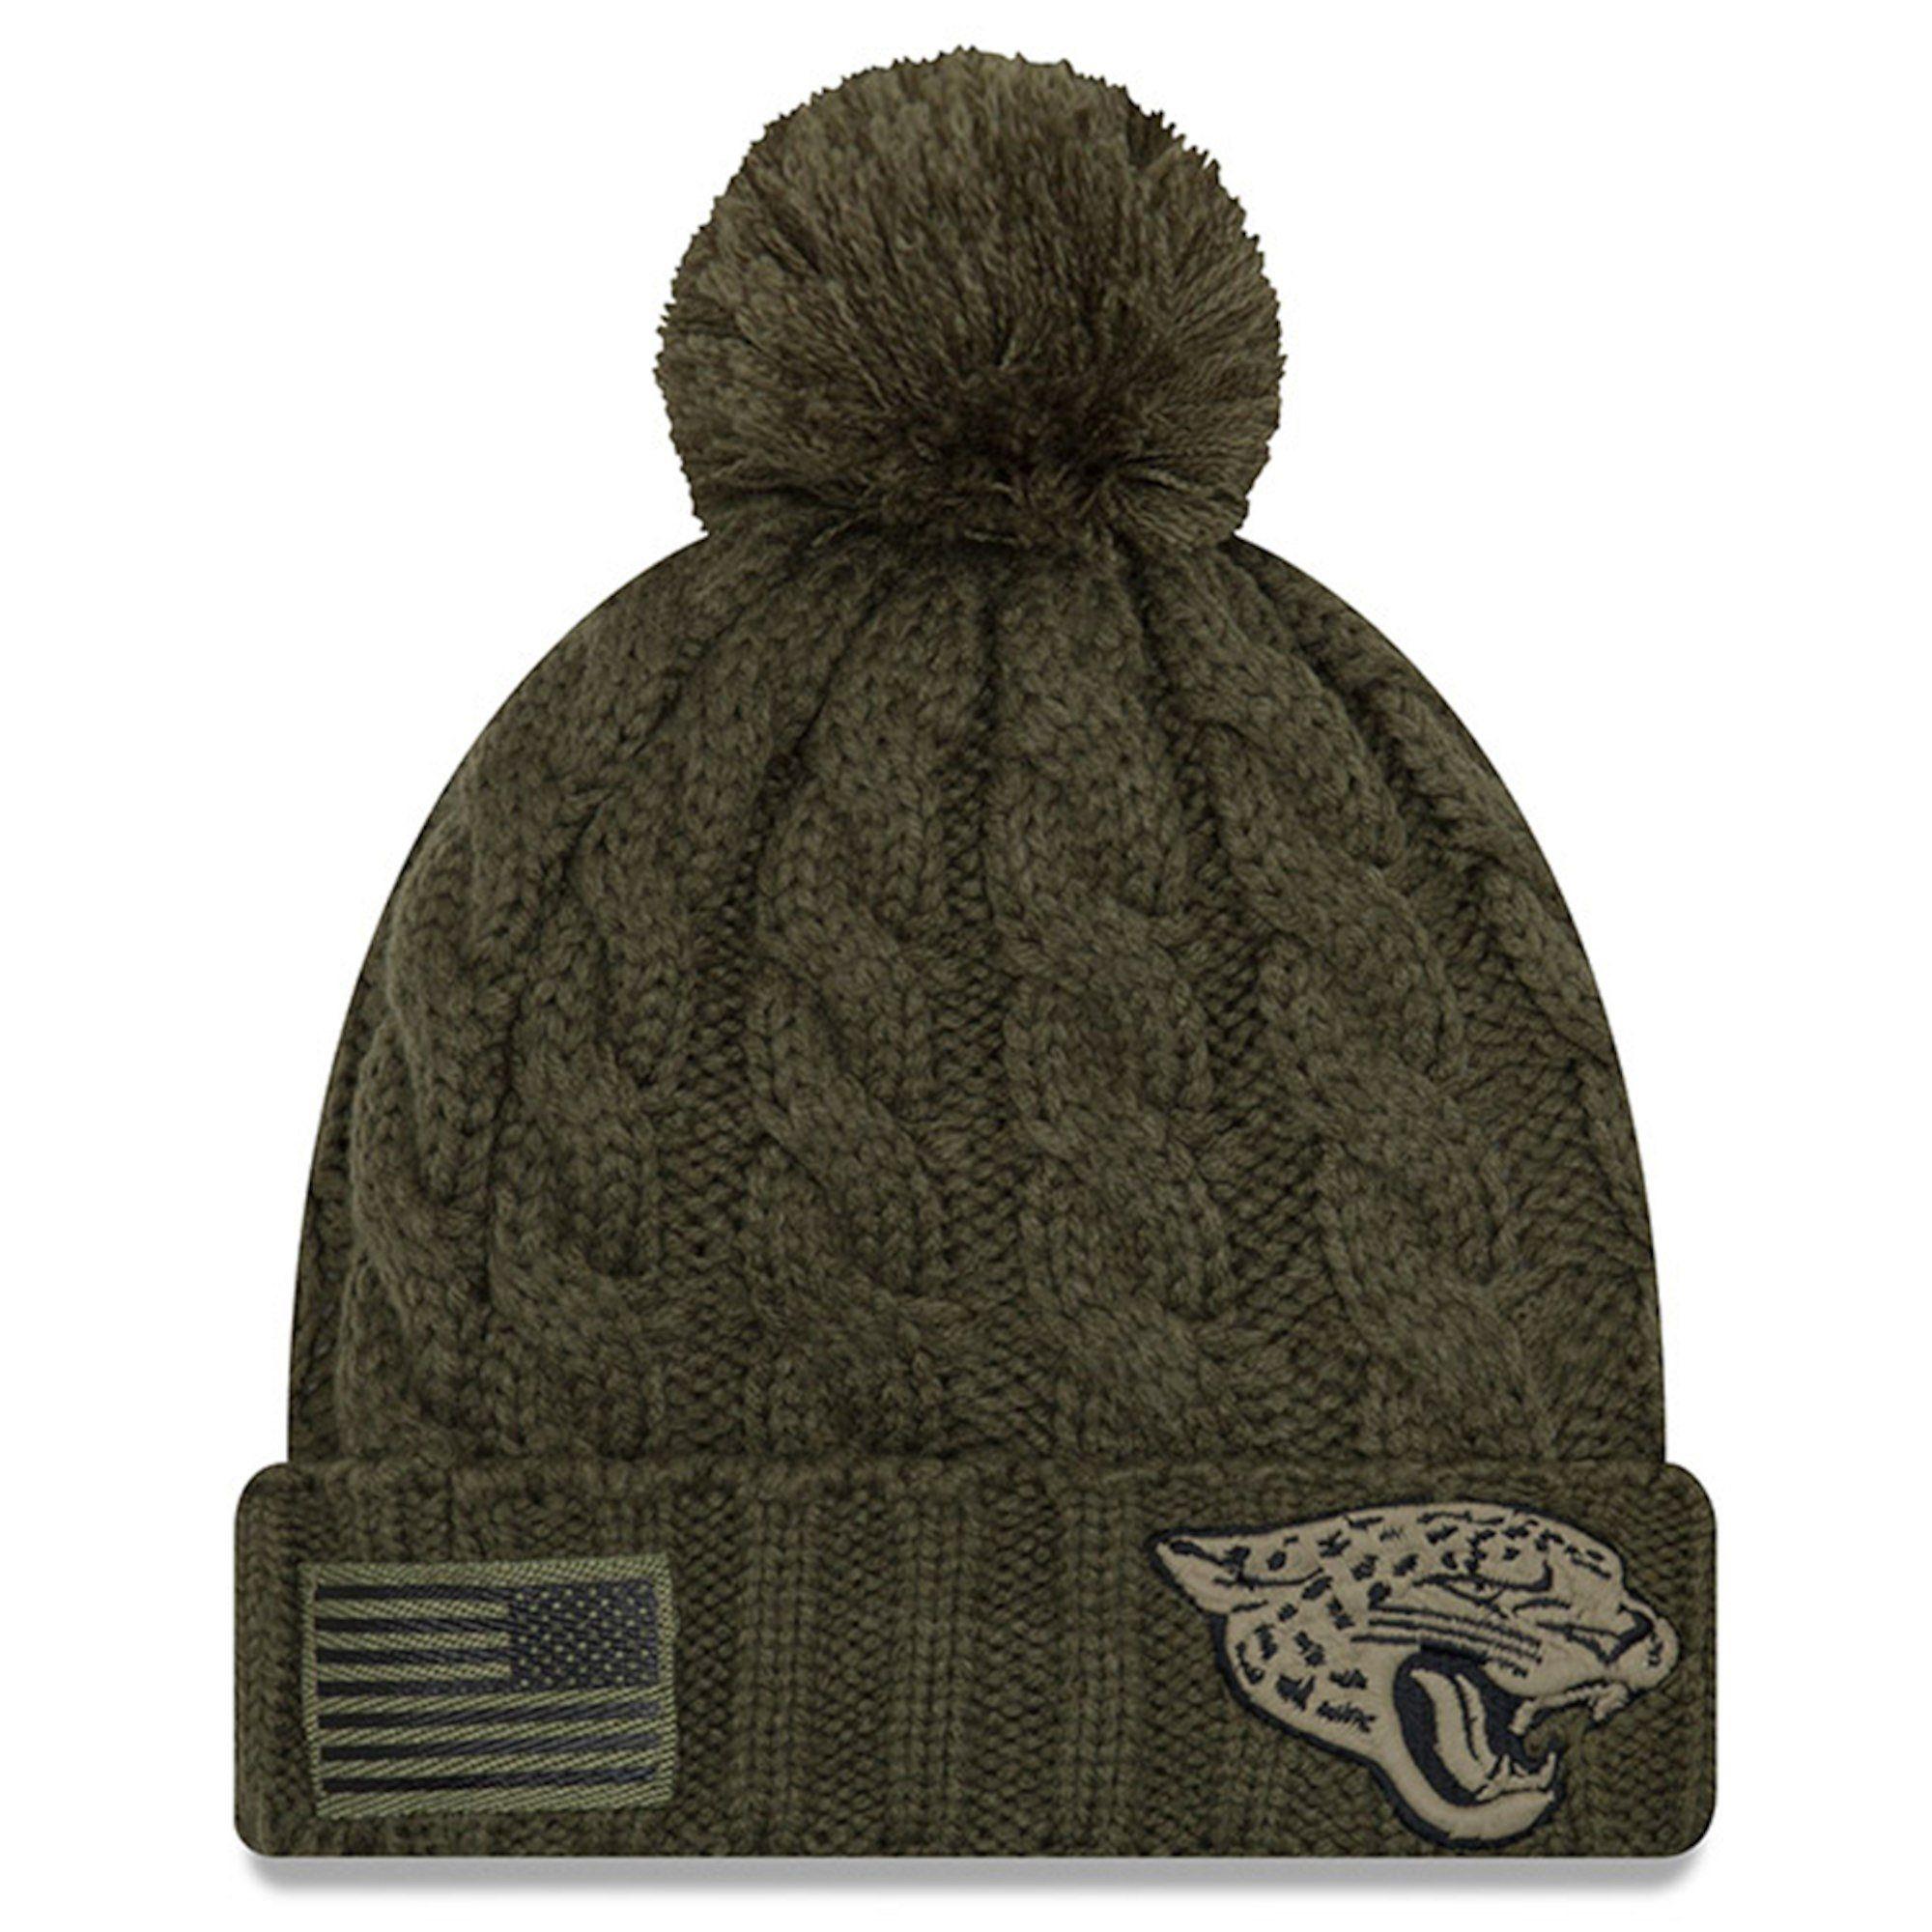 1256b627a NFL Jacksonville Jaguars New Era Women s 2018 Salute to Service Sideline  Cuffed Pom Knit Hat